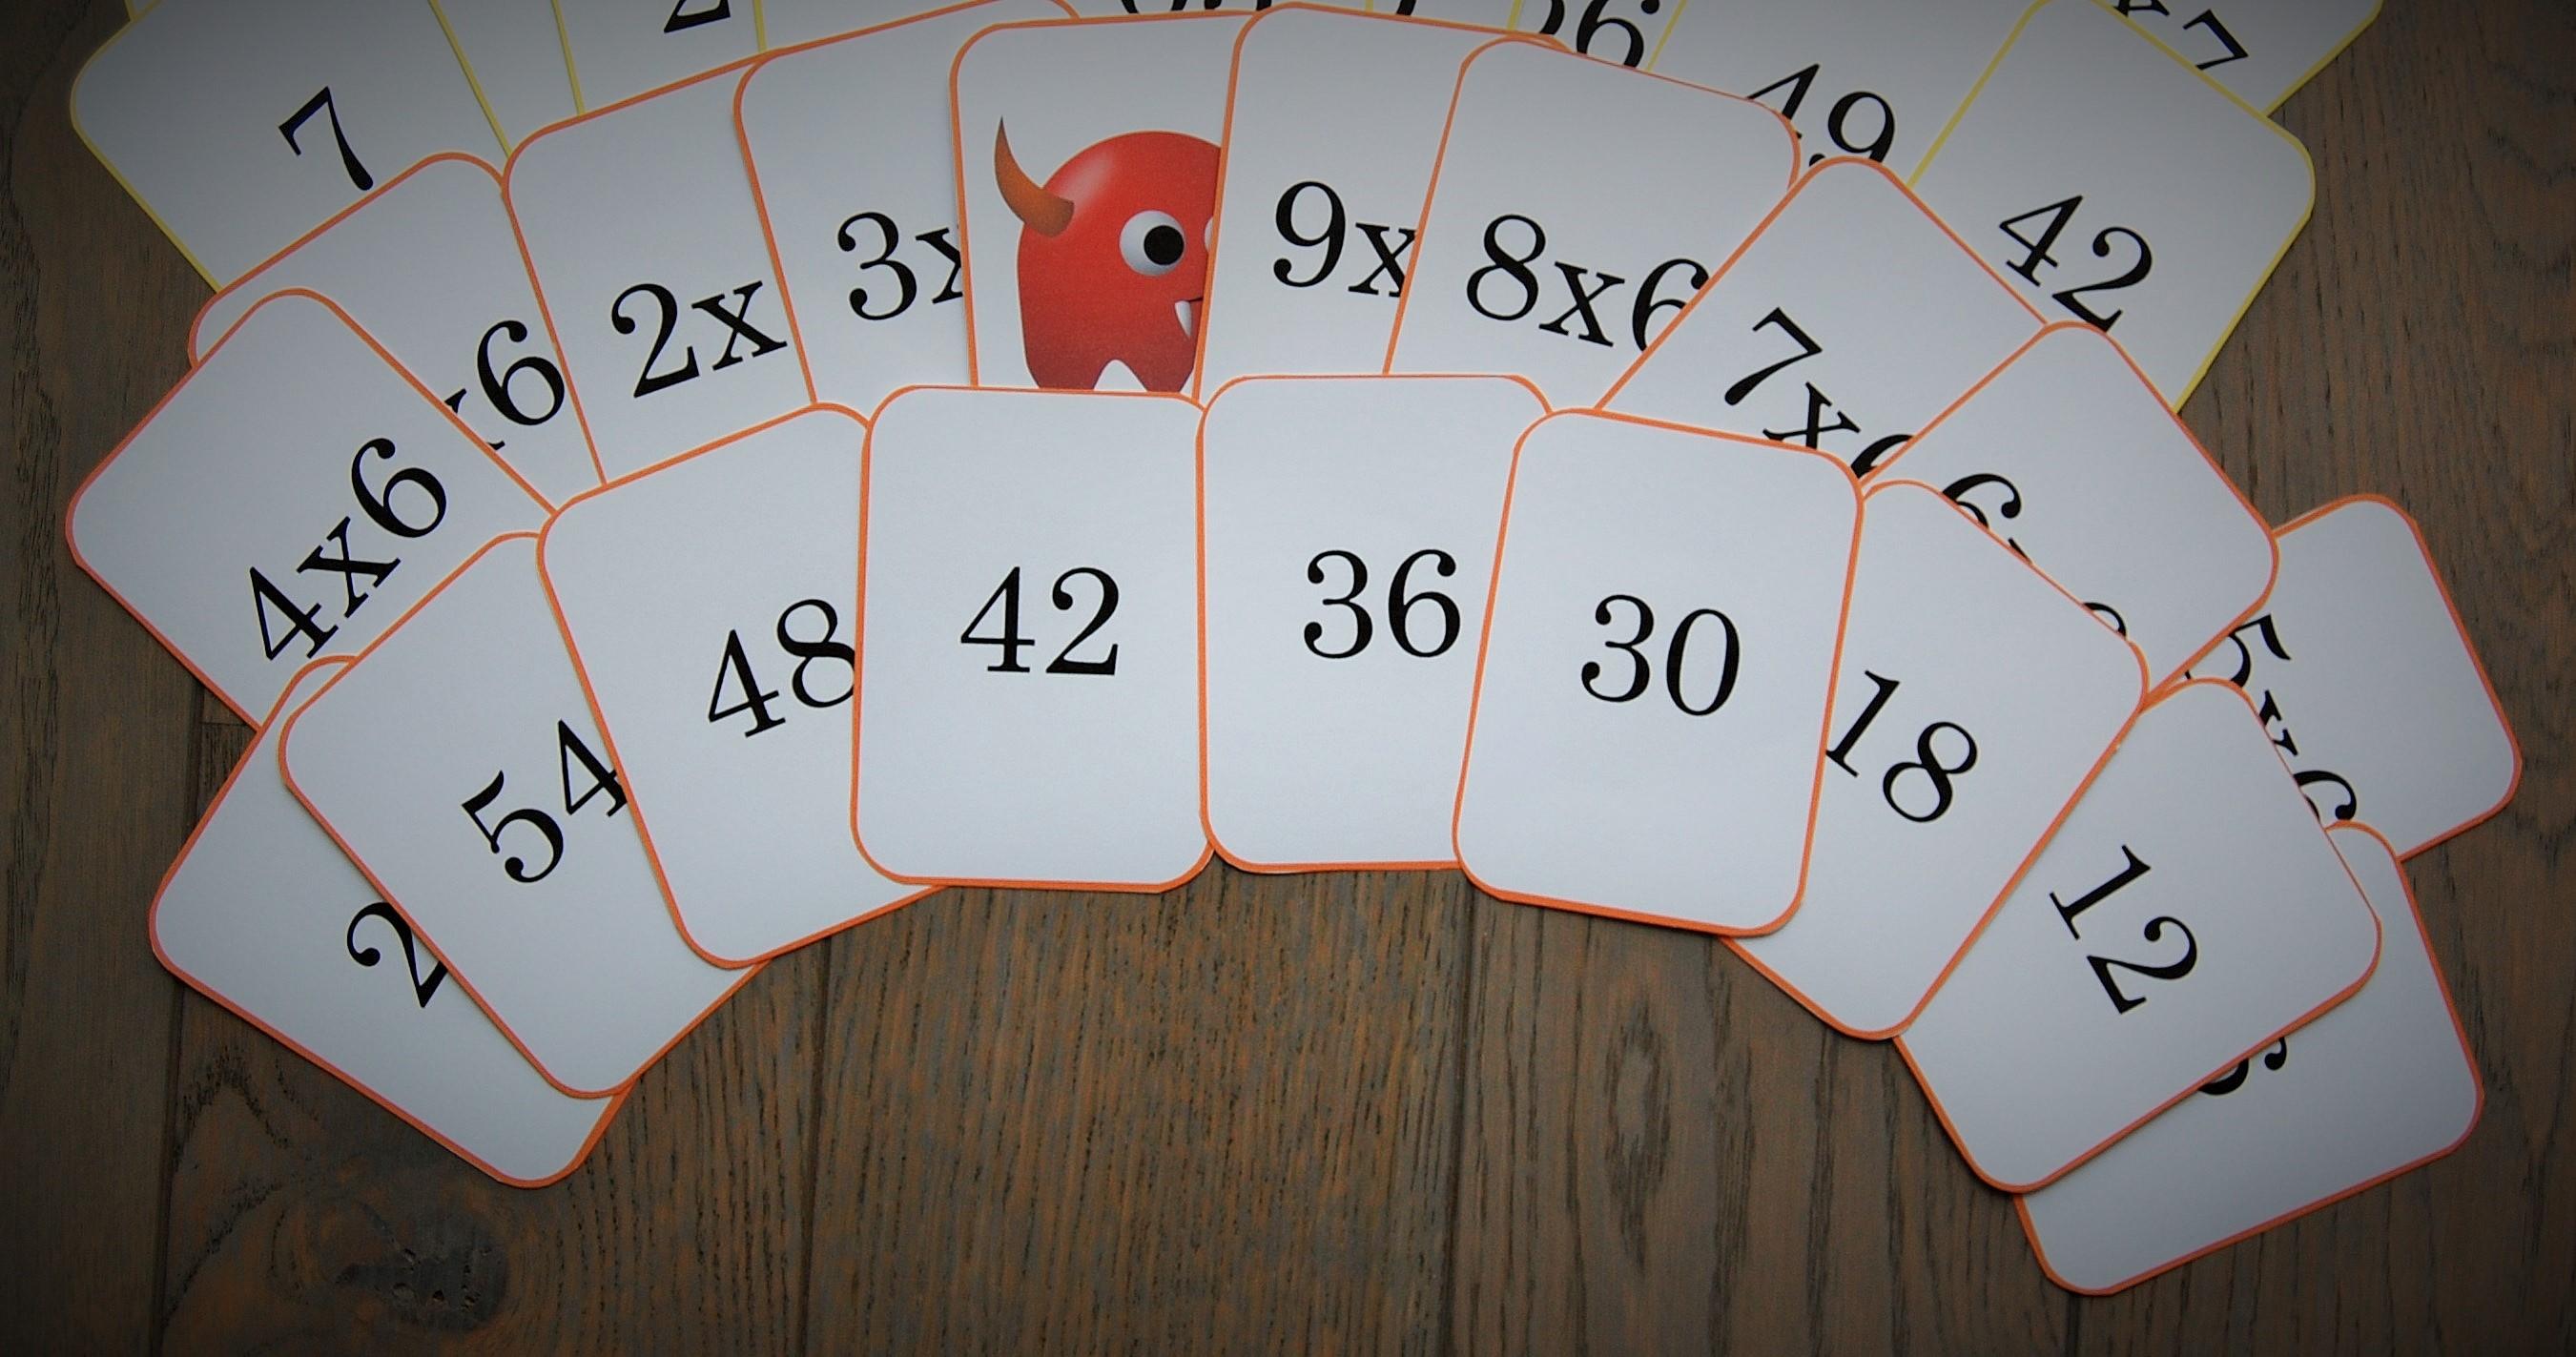 Mistigris des tables x6 x7 x8 x9